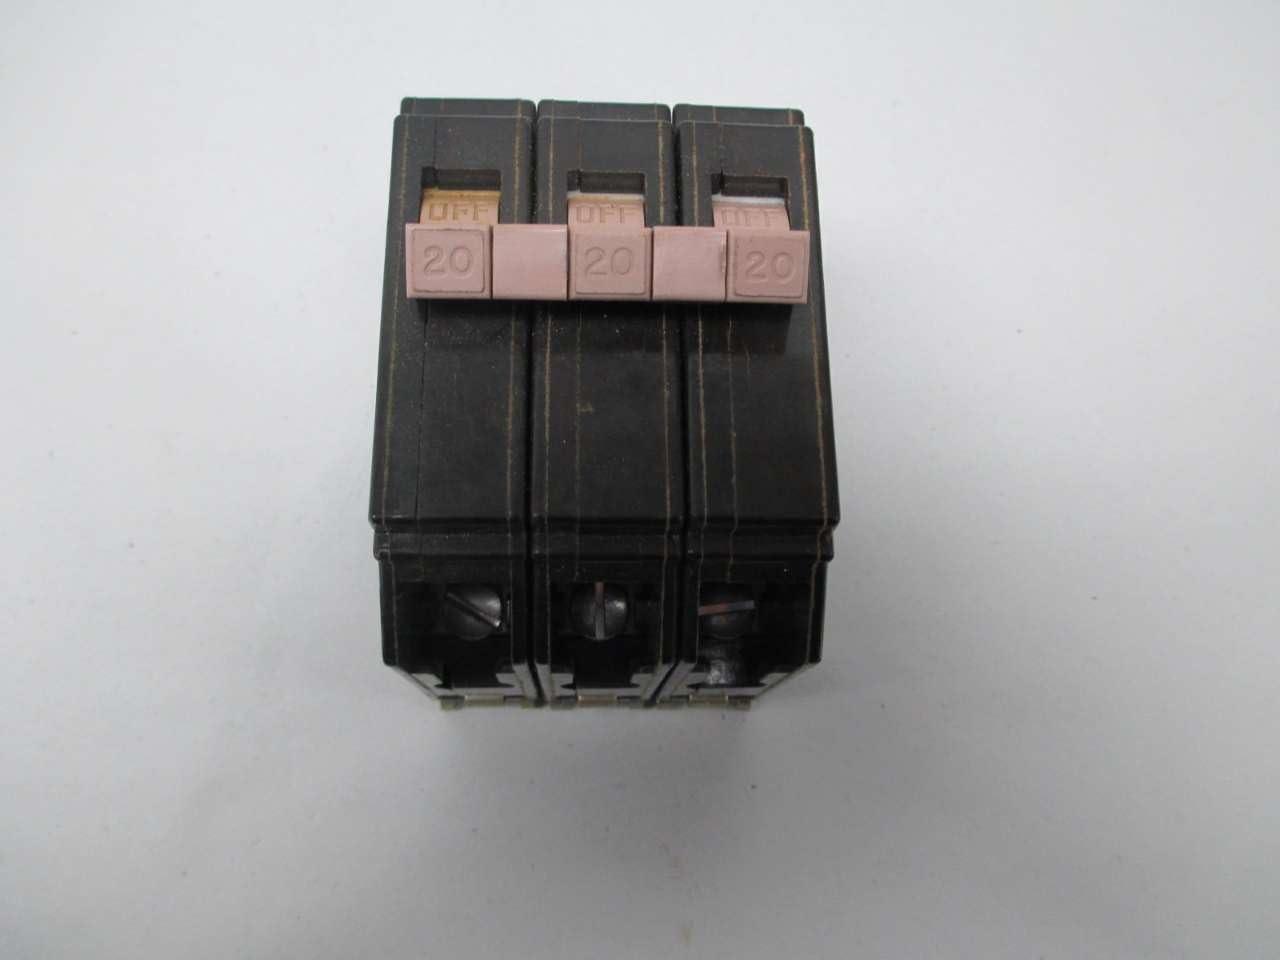 CH320 CH Plg-in type Breaker, Original make